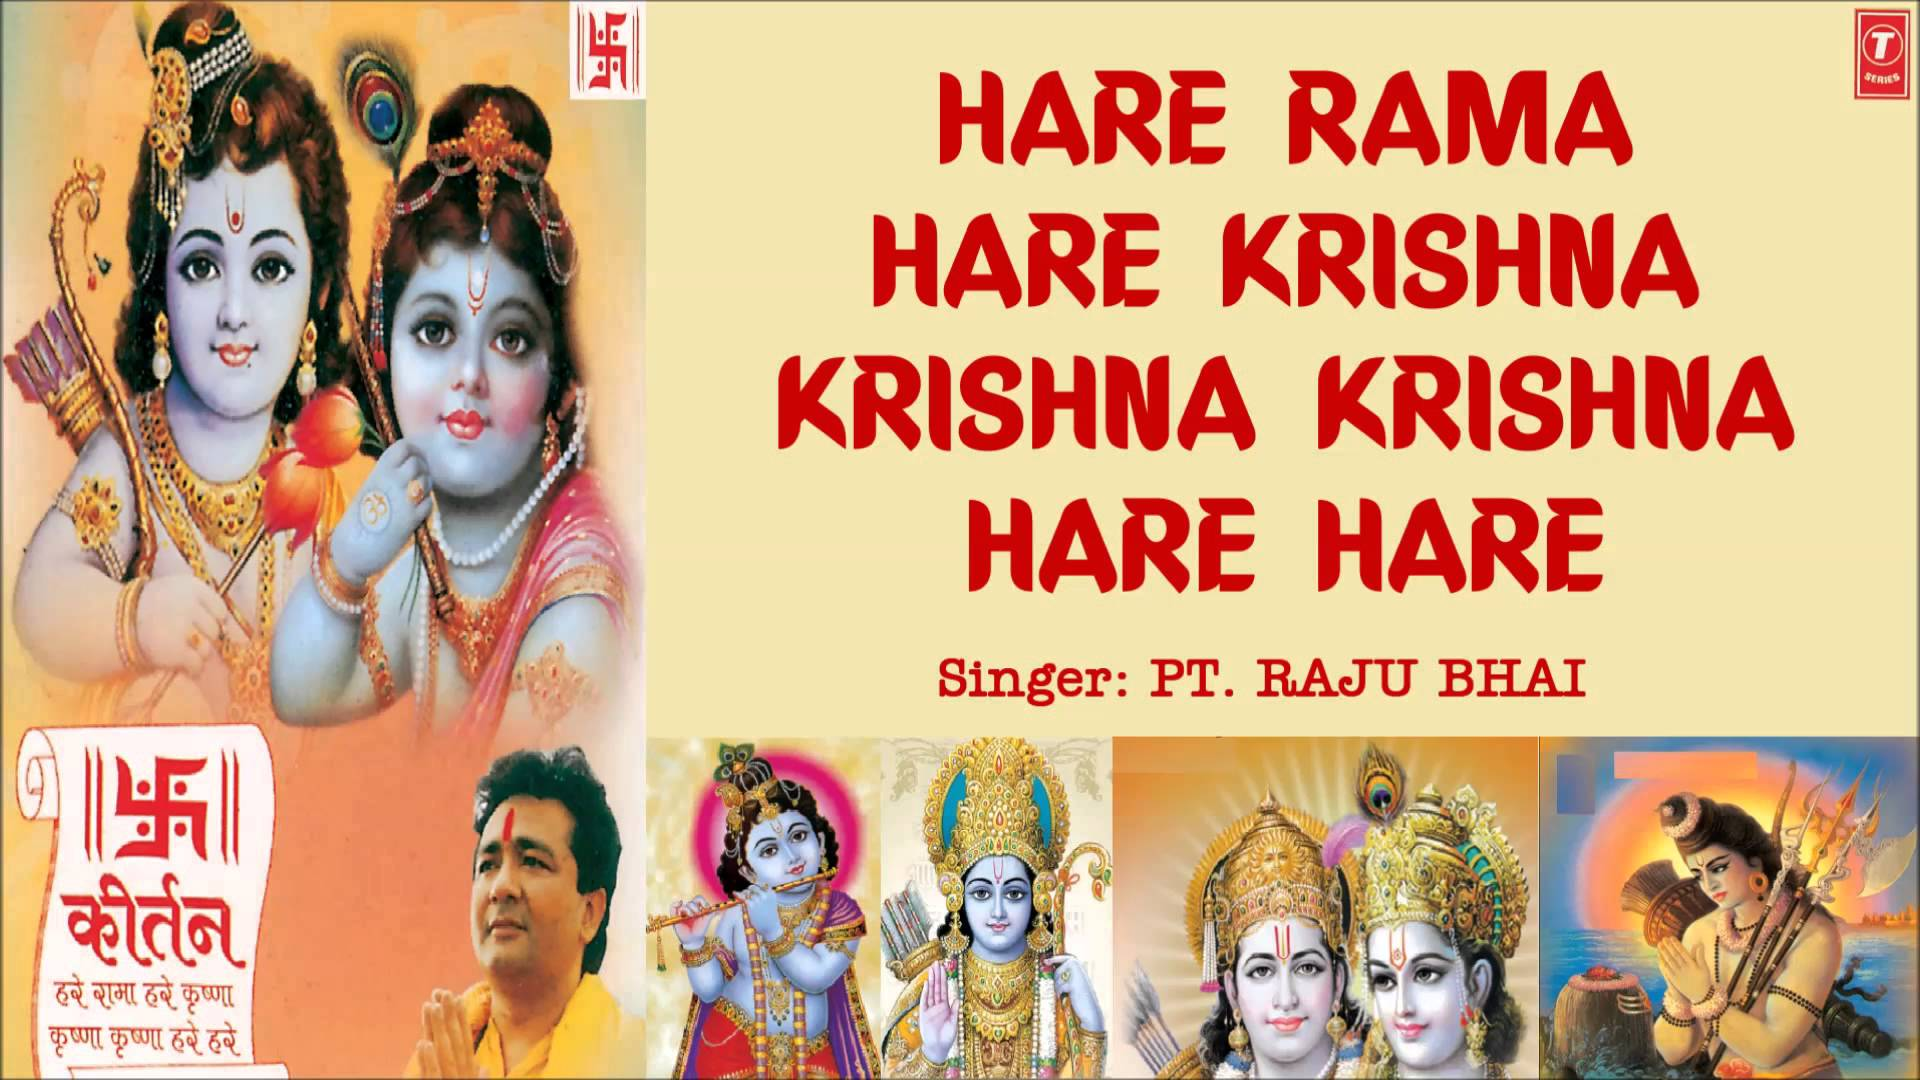 Rama rama krishna krishna wallpapers posters | coolguyramforyou.